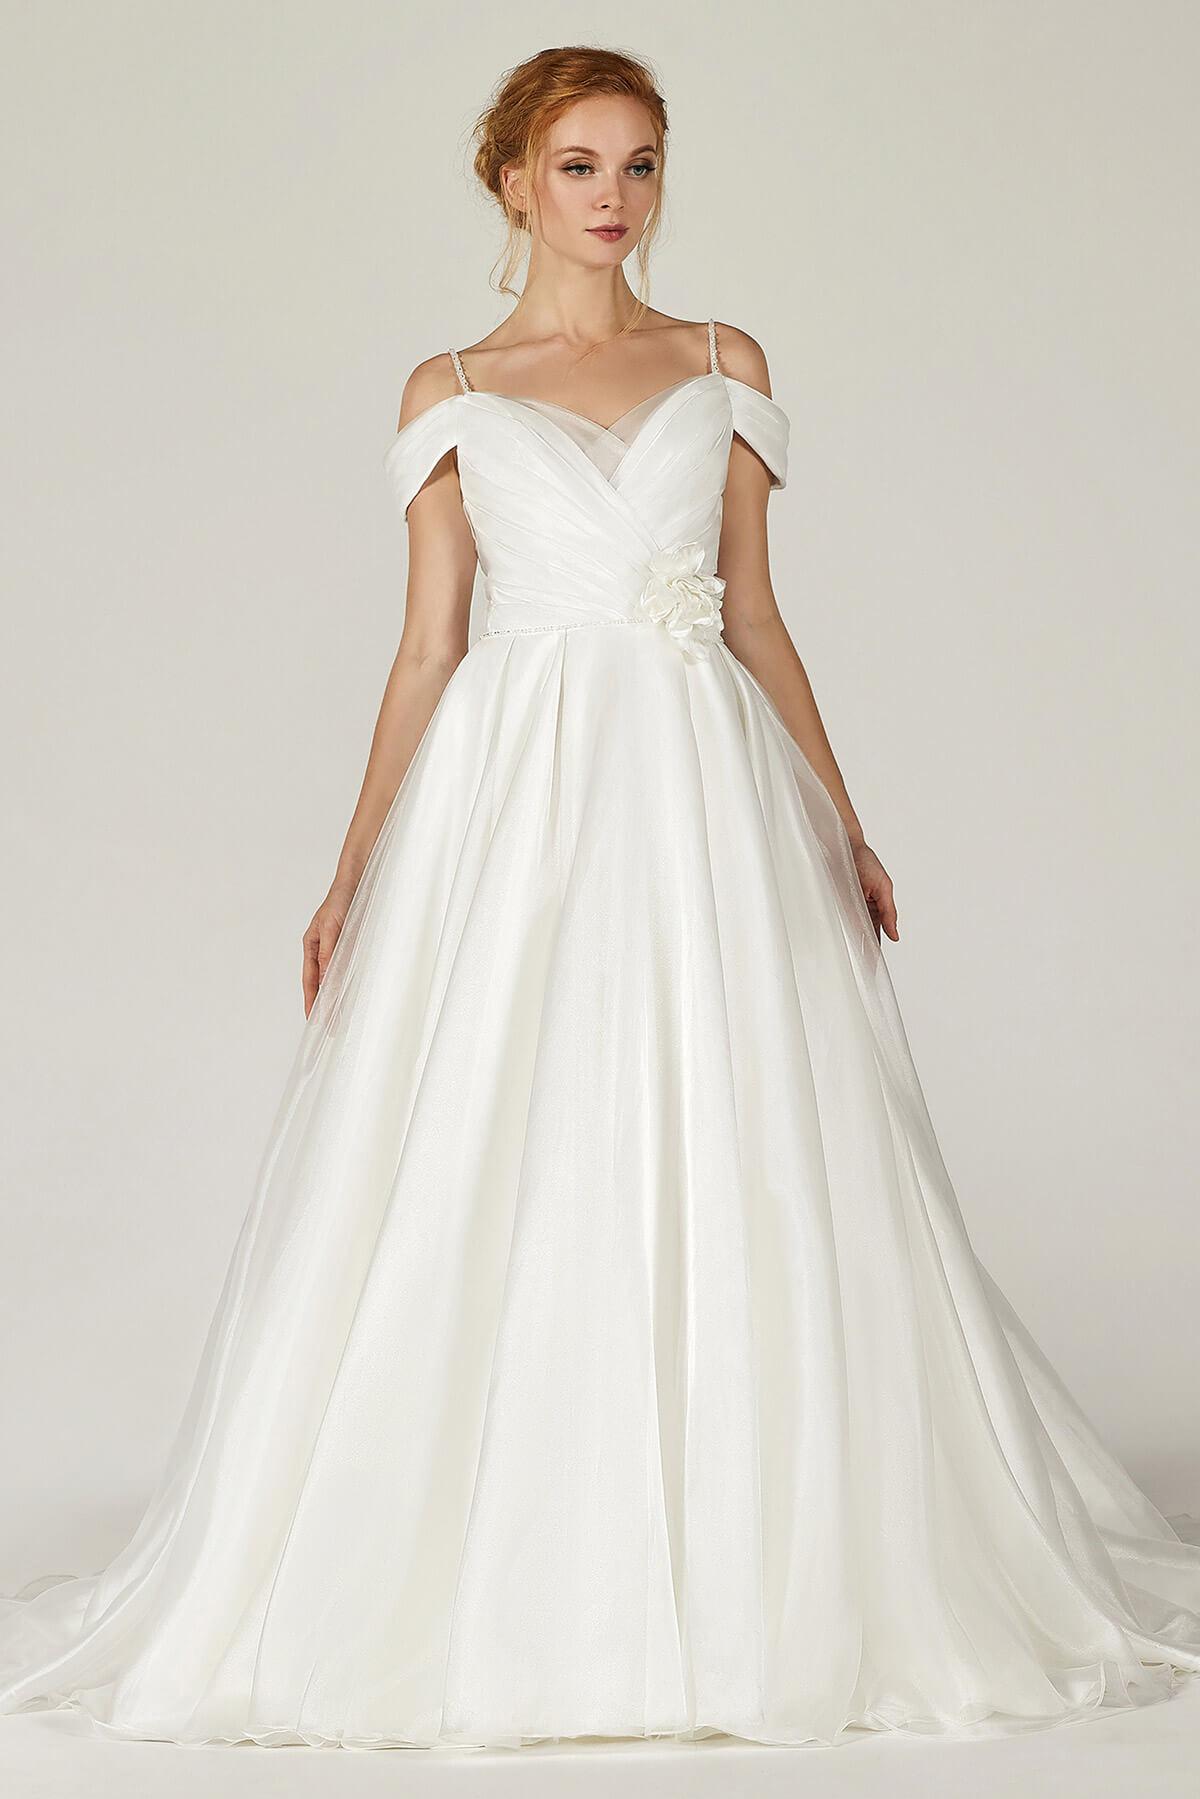 Cocomelody Black Wedding Dress List - CW2291